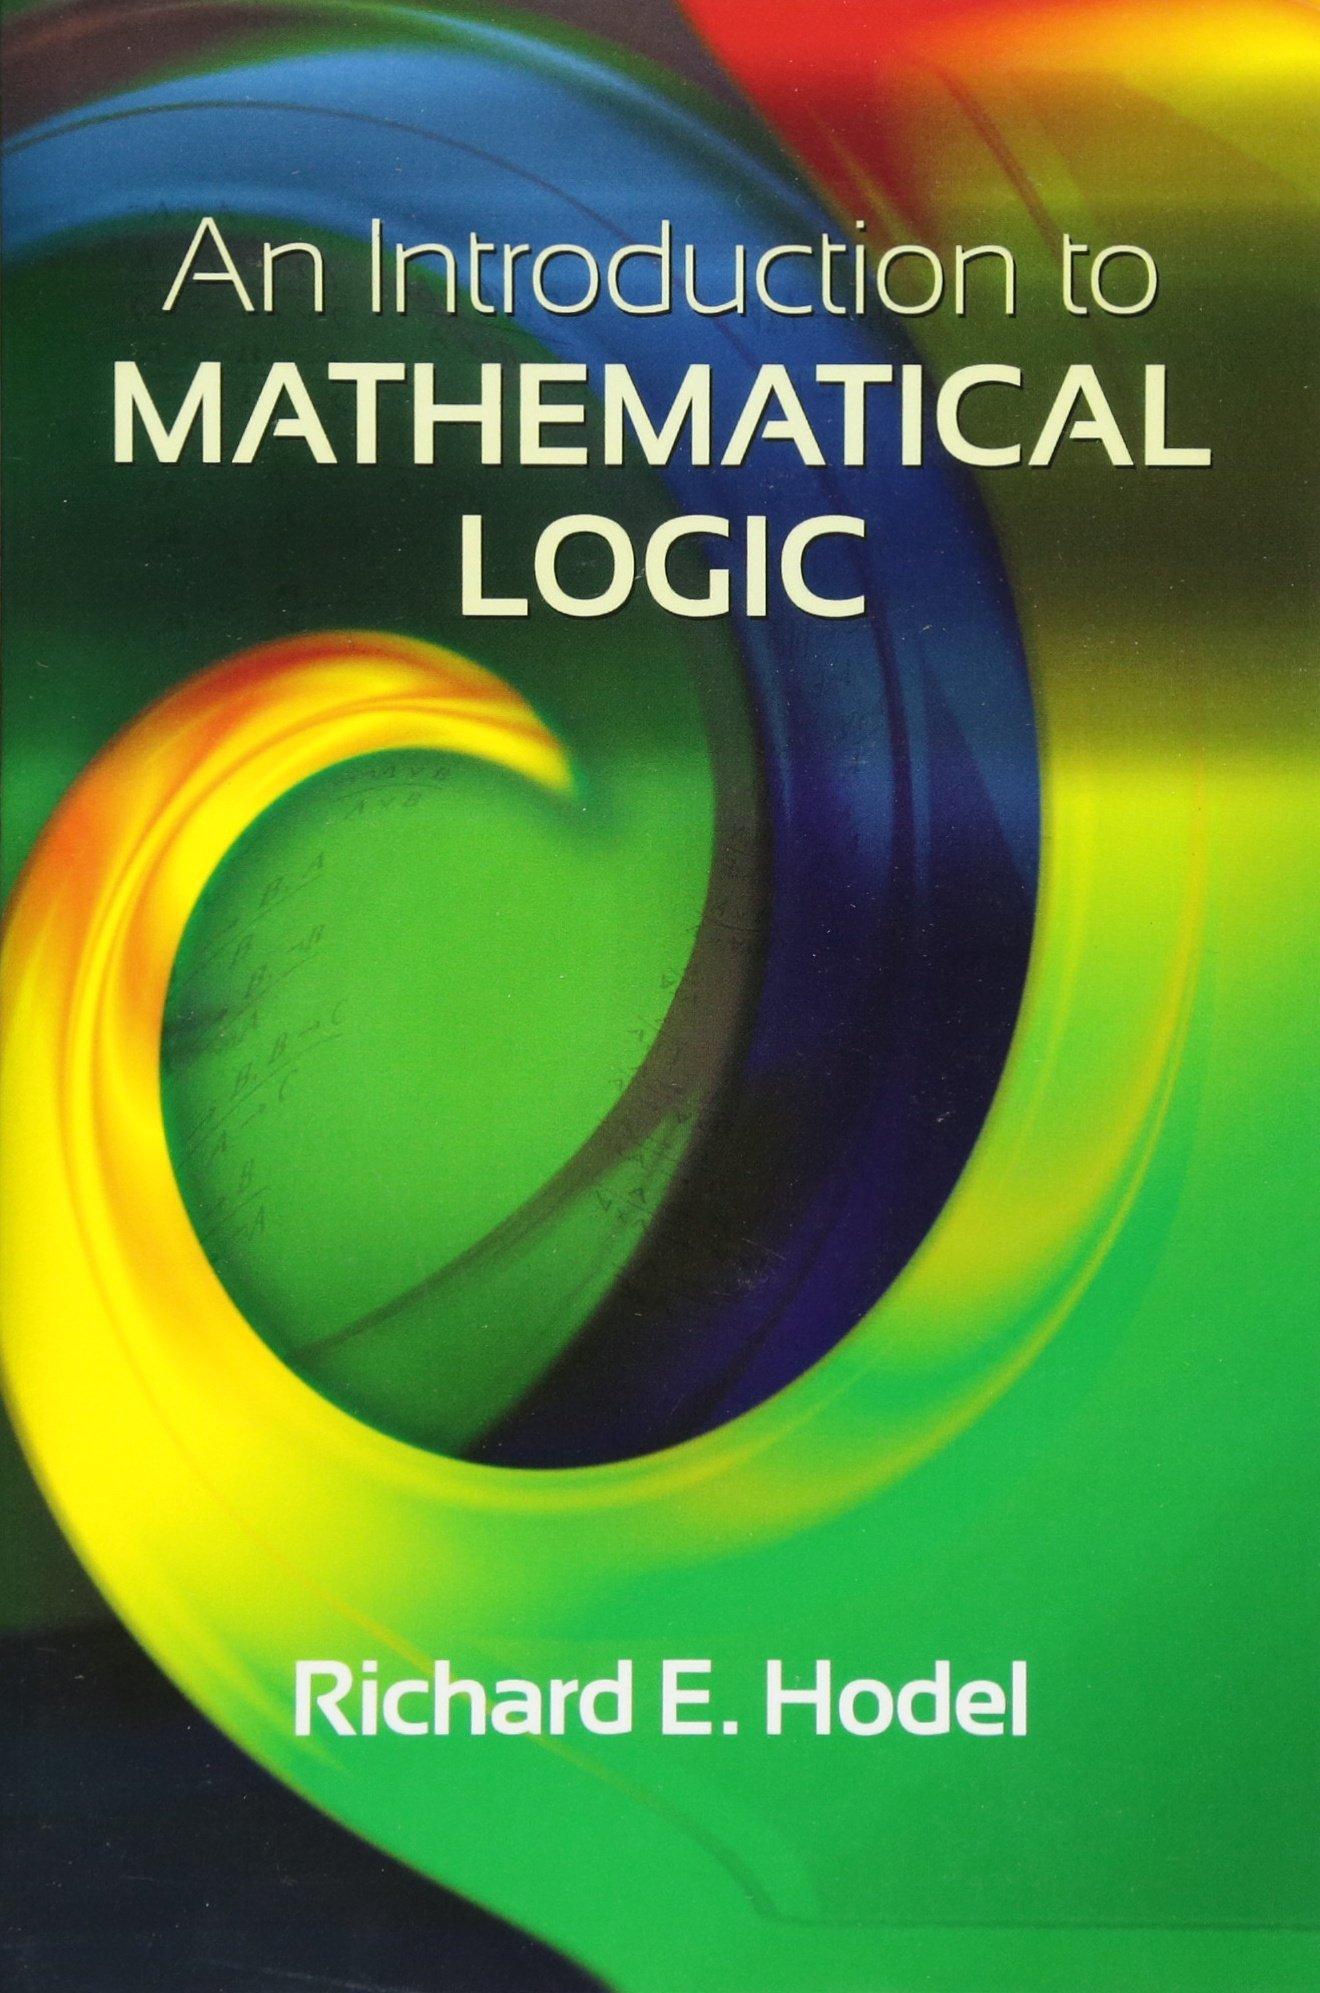 An Introduction to Mathematical Logic (Dover Books on Mathematics) pdf